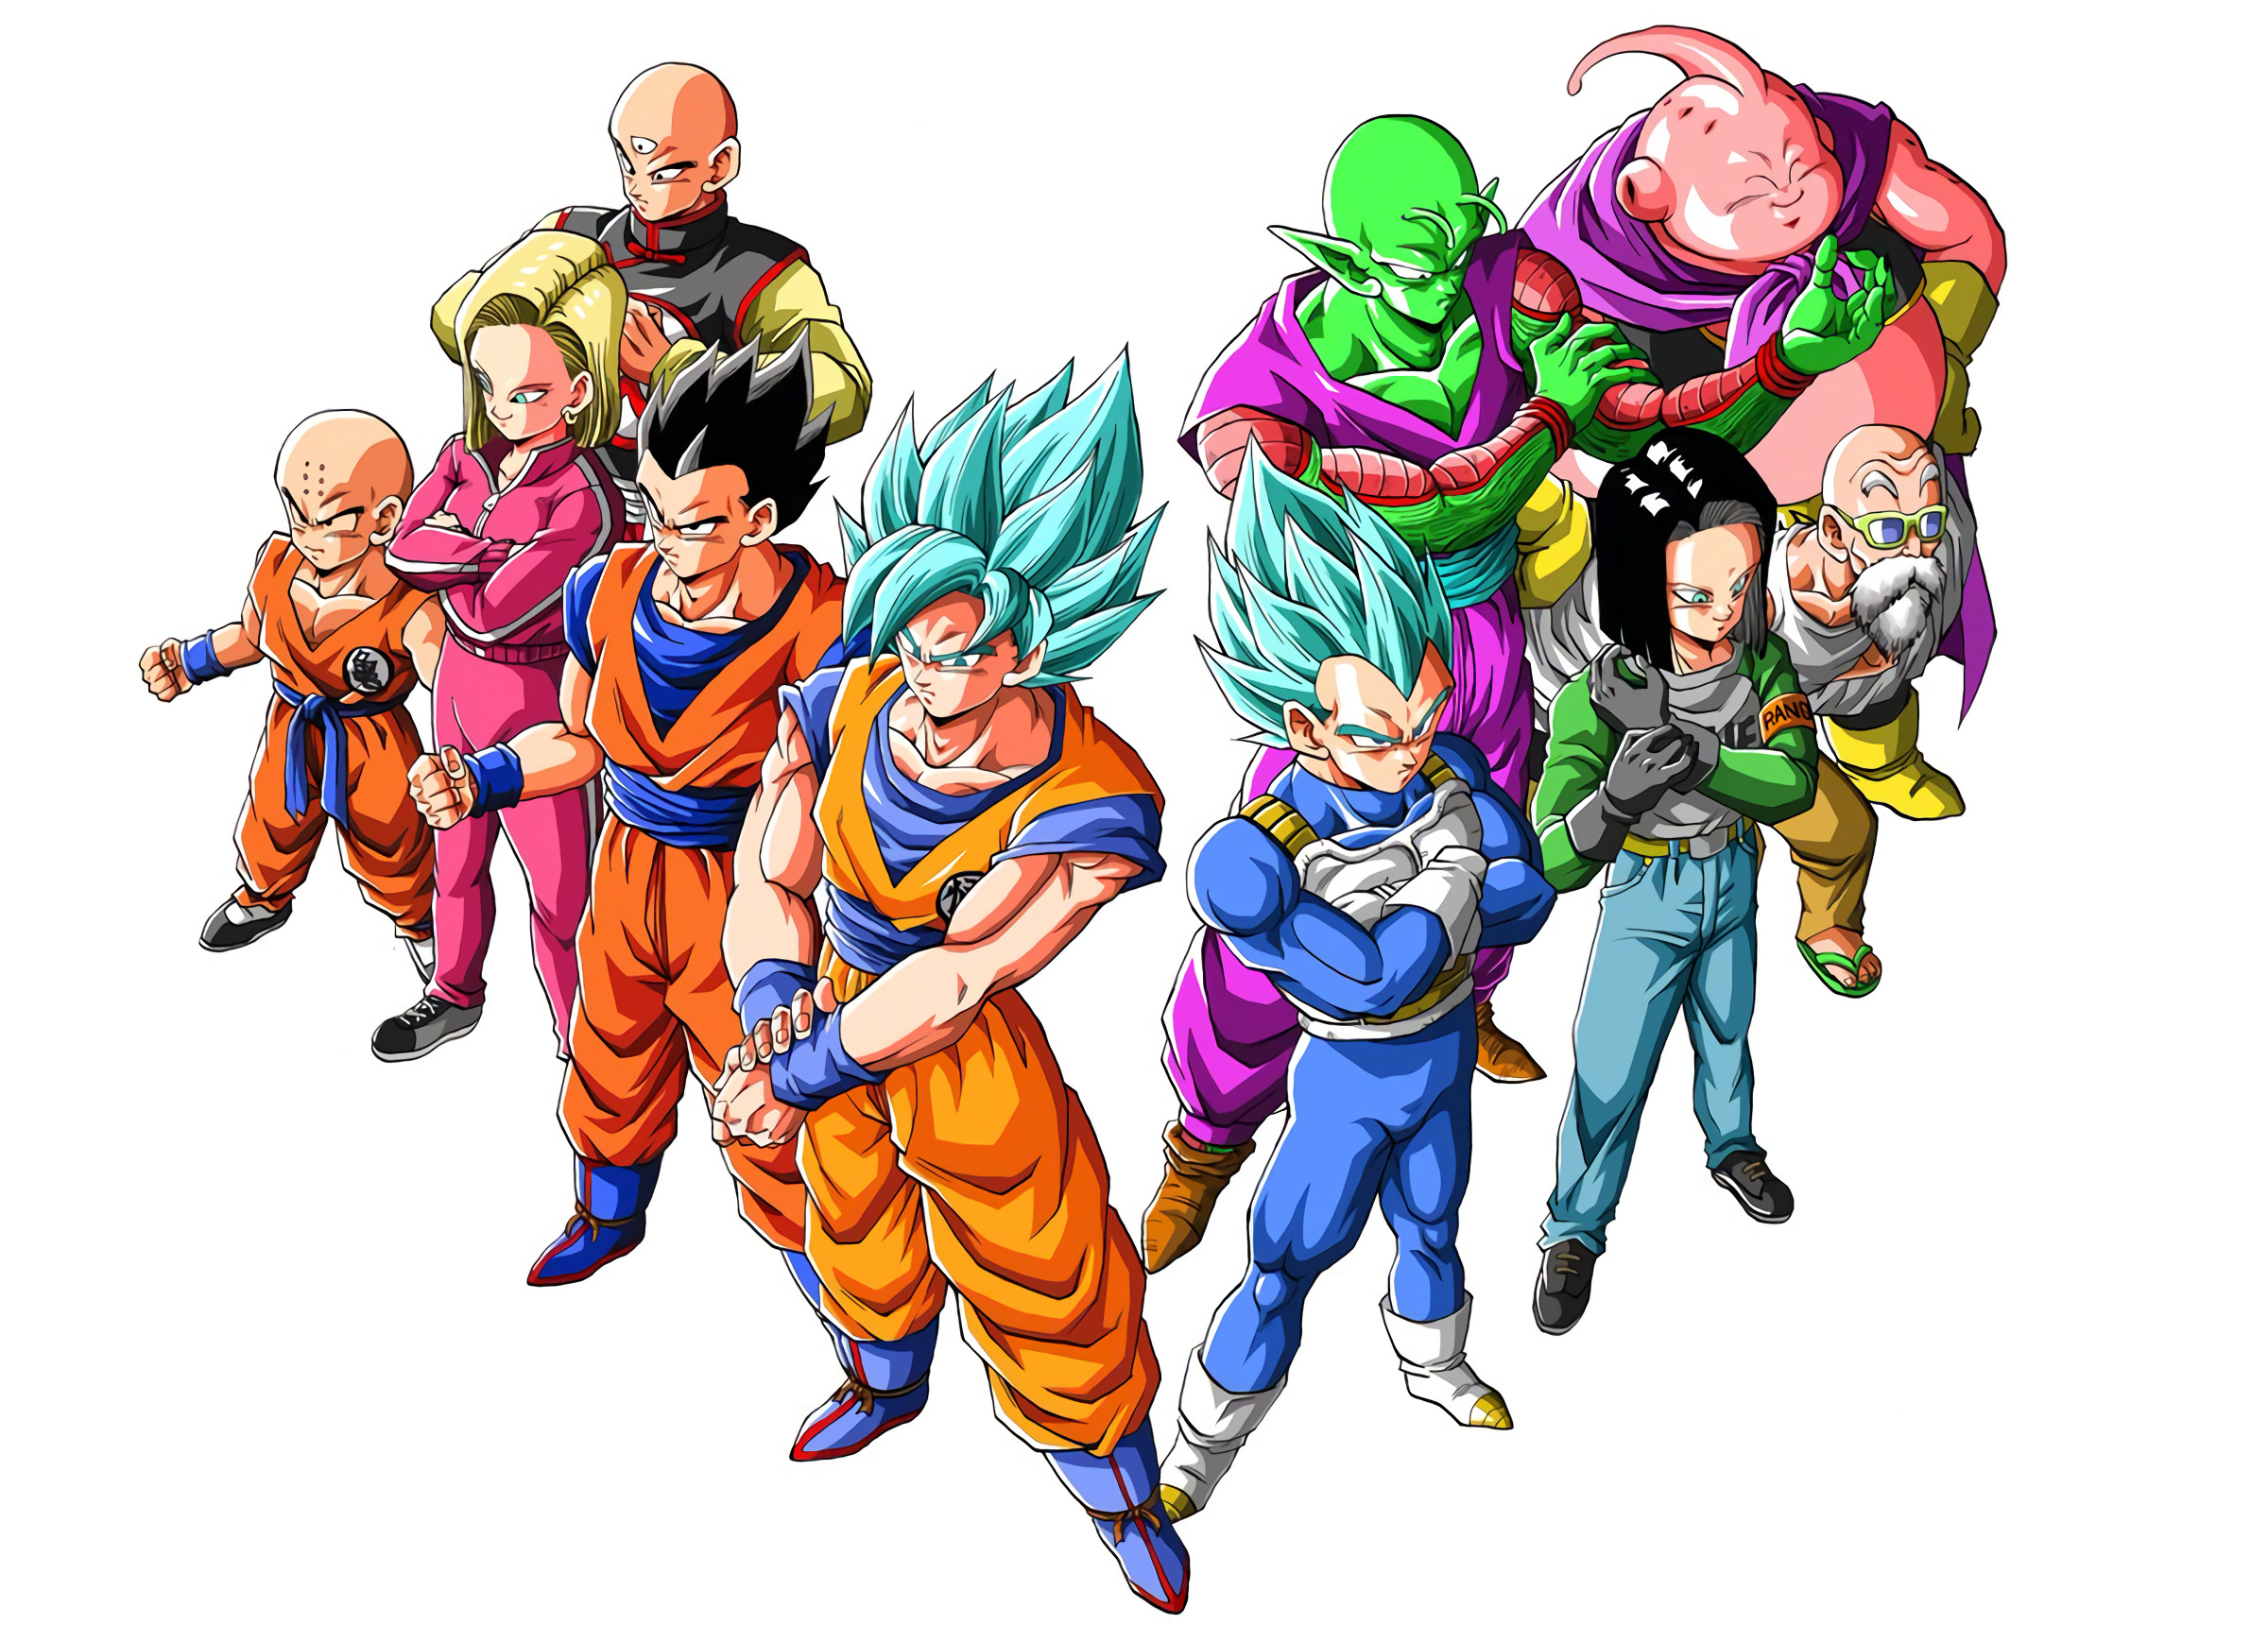 HD Wallpaper   Background ID:792402. Anime Dragon Ball Super